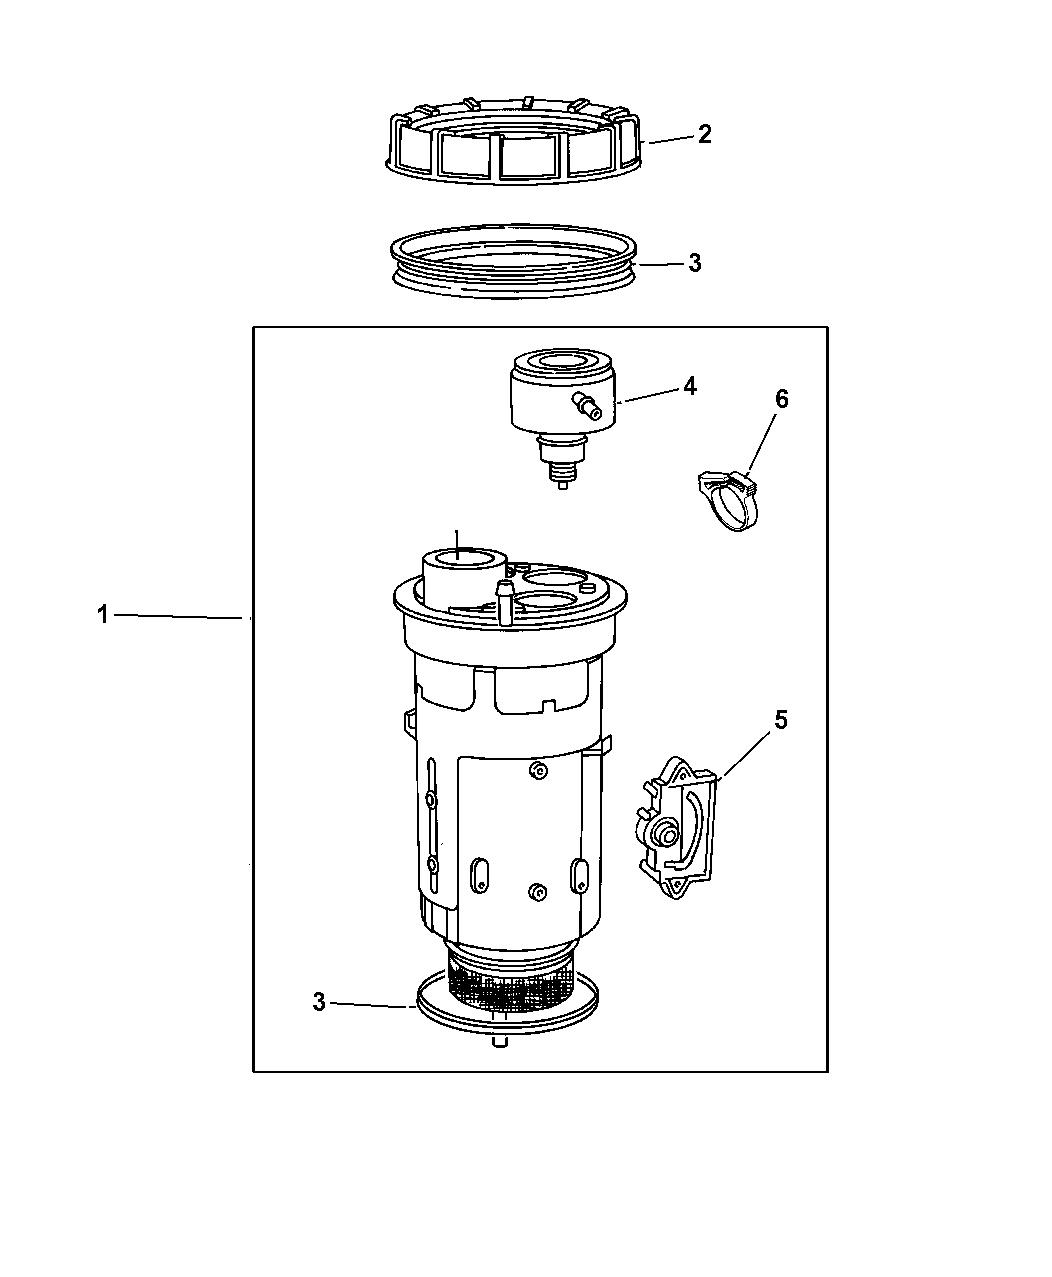 1997 Jeep Grand Cherokee Fuel Module - Mopar Parts Giant